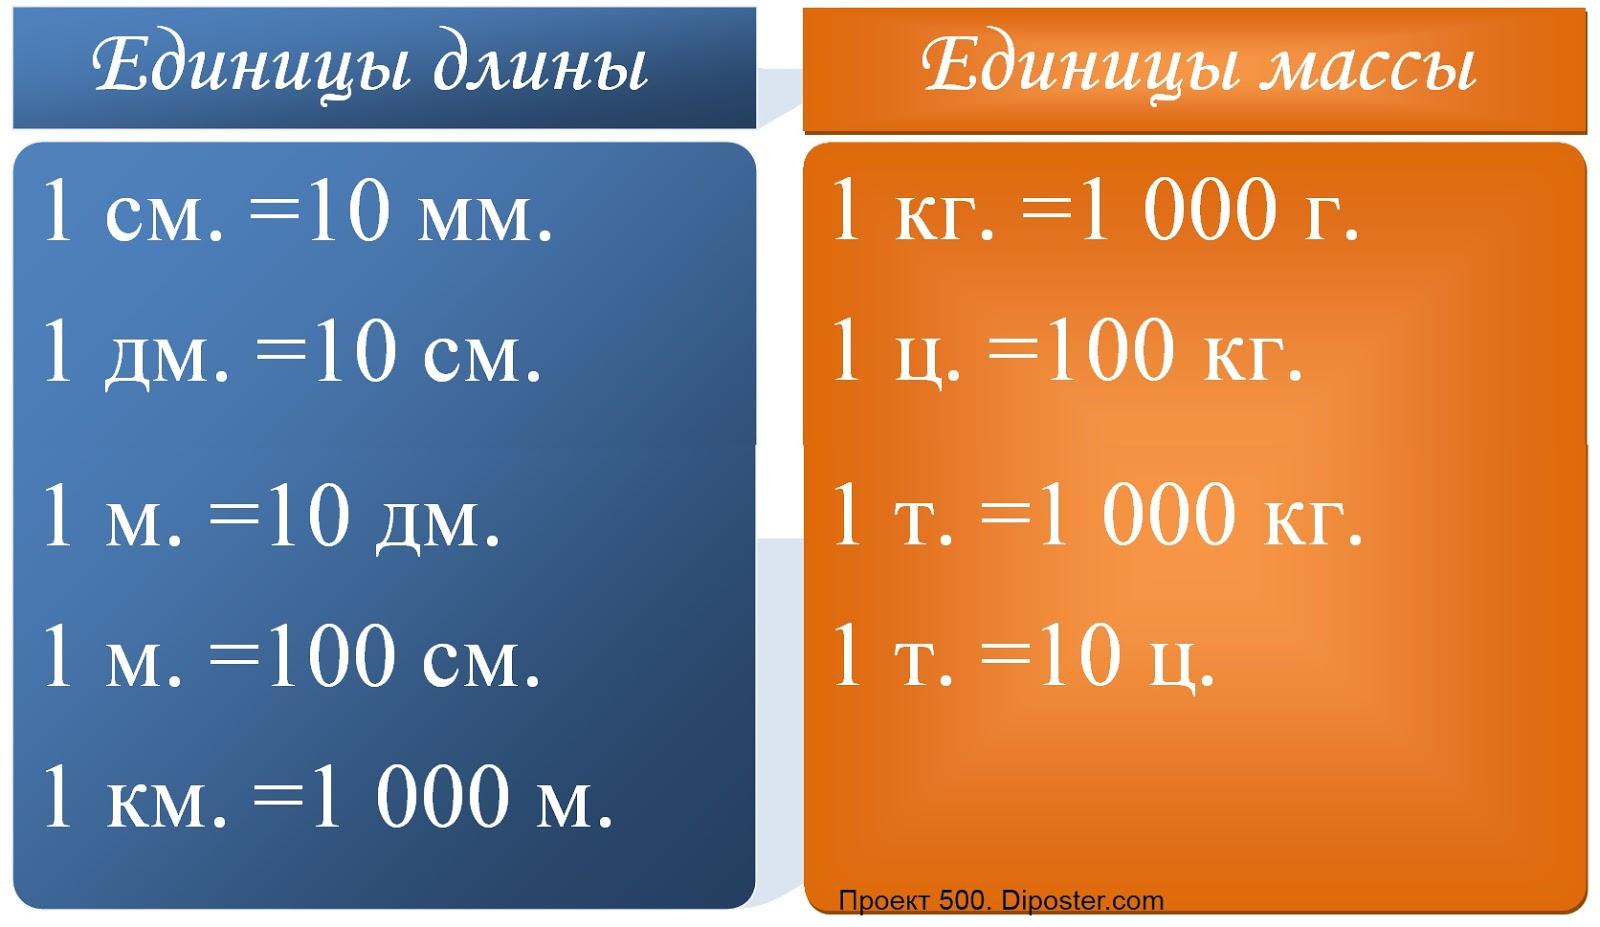 Сантиметр (см) - единица длины наблюдение